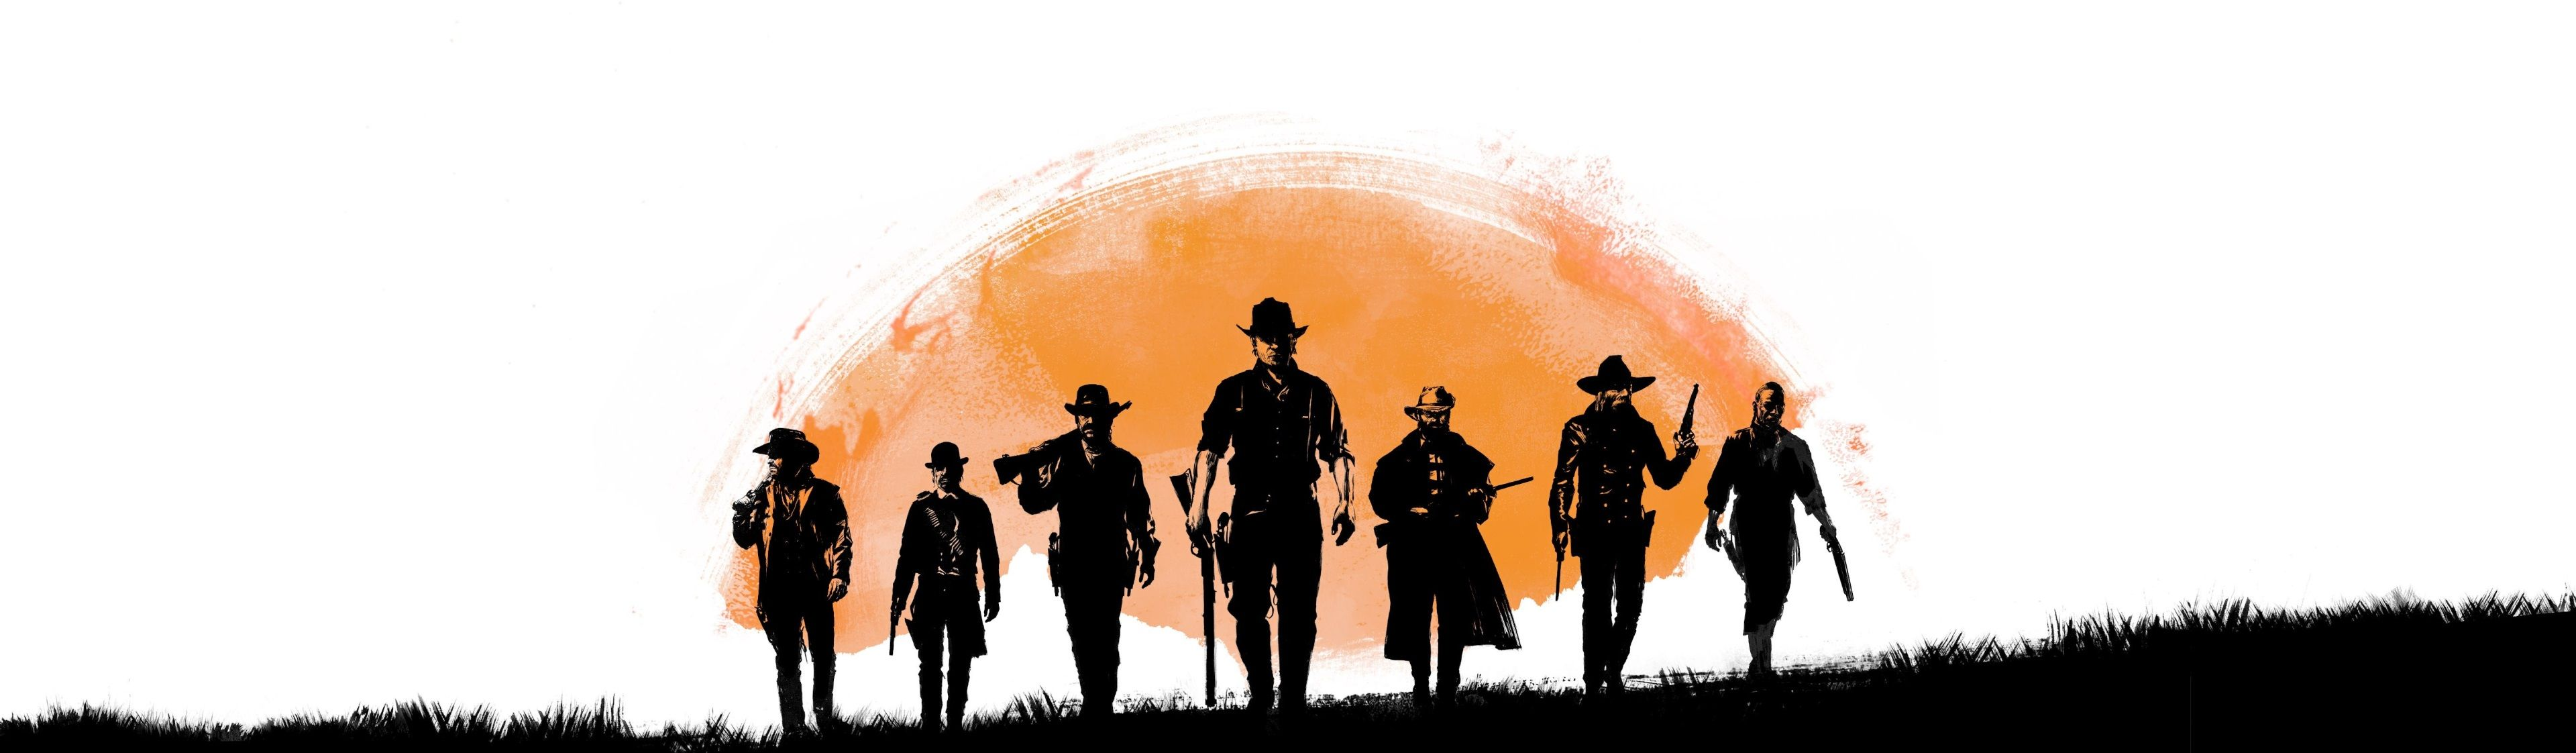 3840x1122 Red Dead Redemption 2 4k Download Hd Pc Wallpaper Red Dead Redemption Red Dead Redemption Ii Videogames Artwork